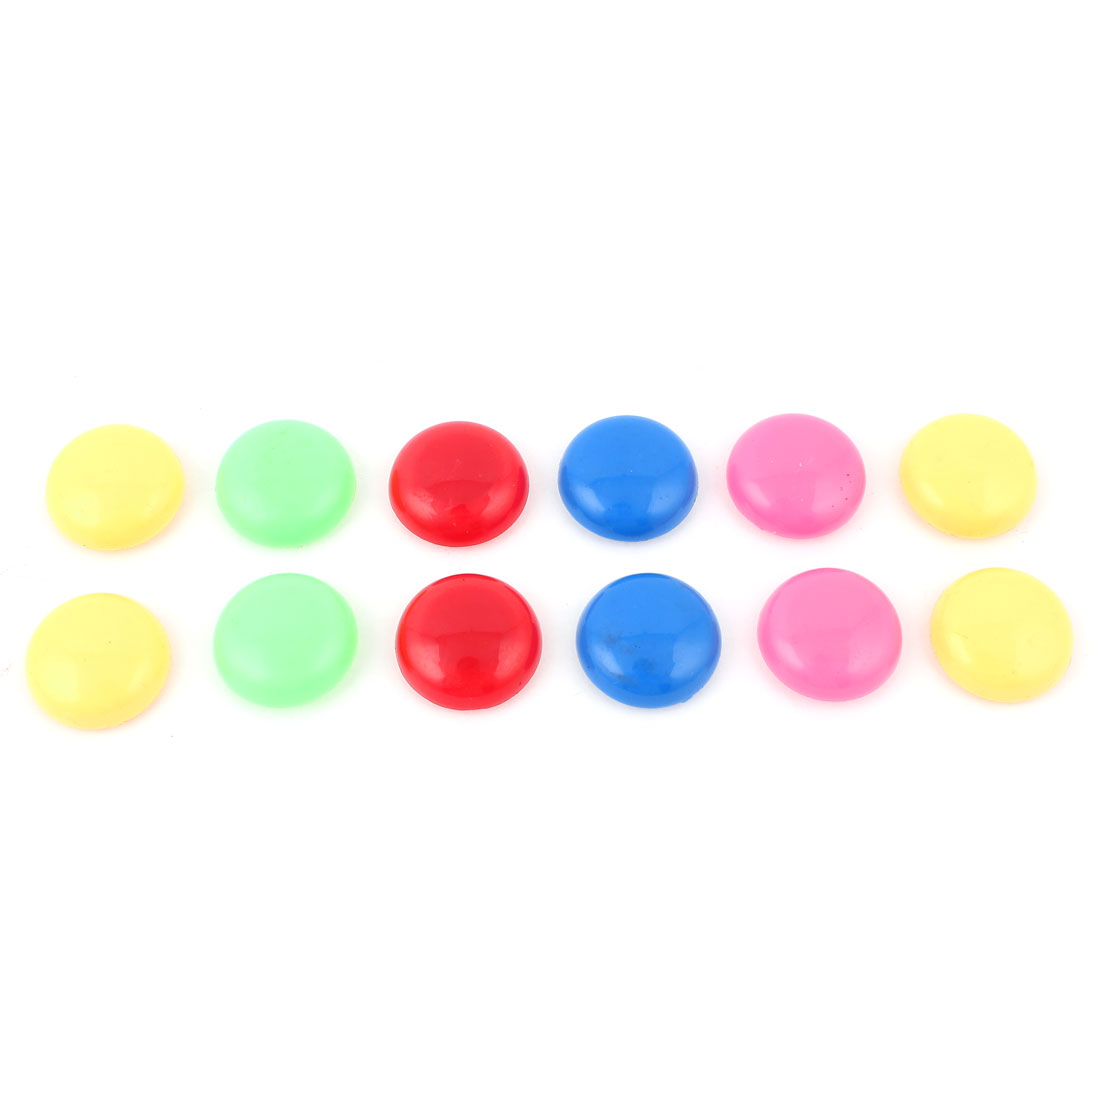 12pcs 29mm Dia Assorted Color Plastic Round Blackboard Whiteboard Fridge Magnetic Sticker